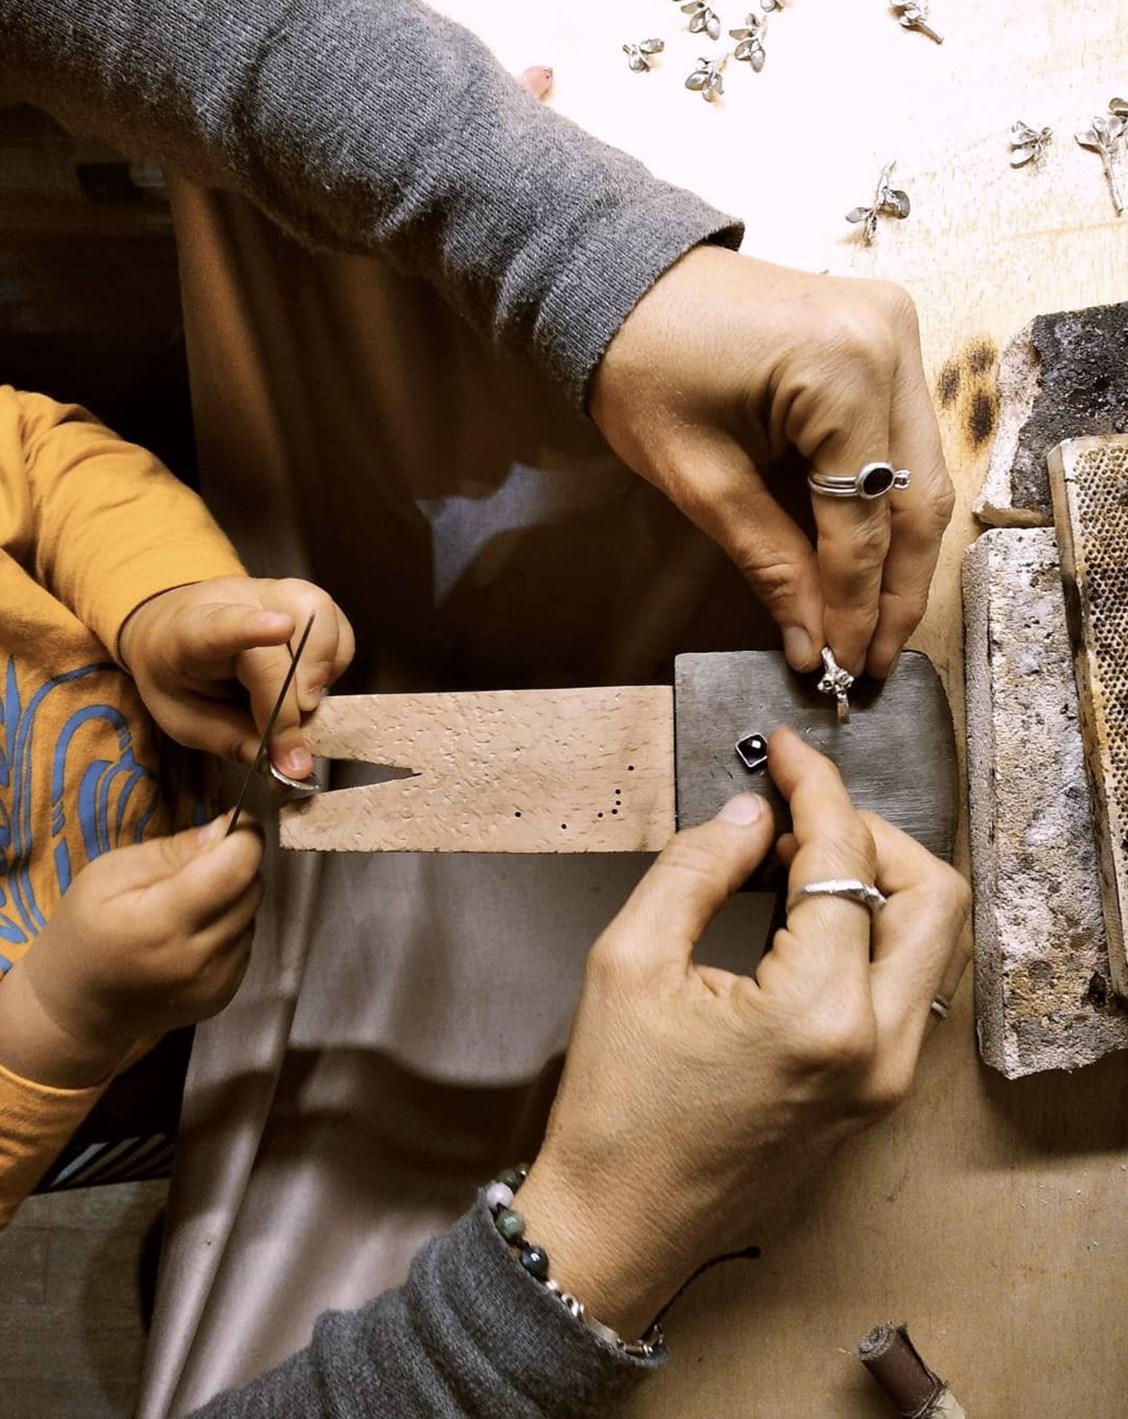 handmade hands